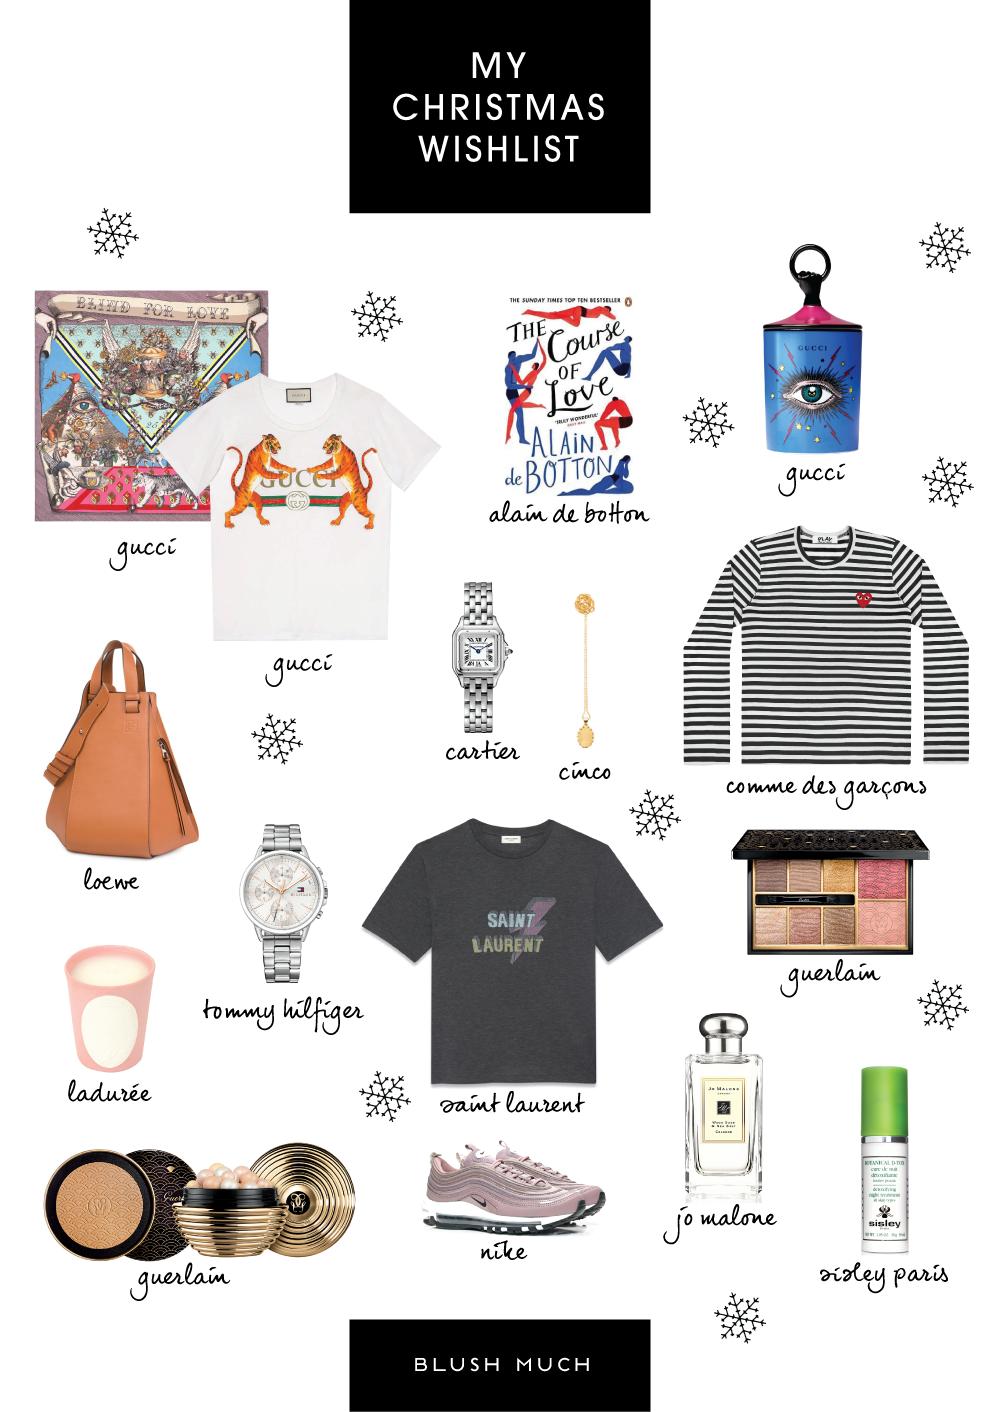 My Christmas Wish List.My Christmas Wishlist Blush Much